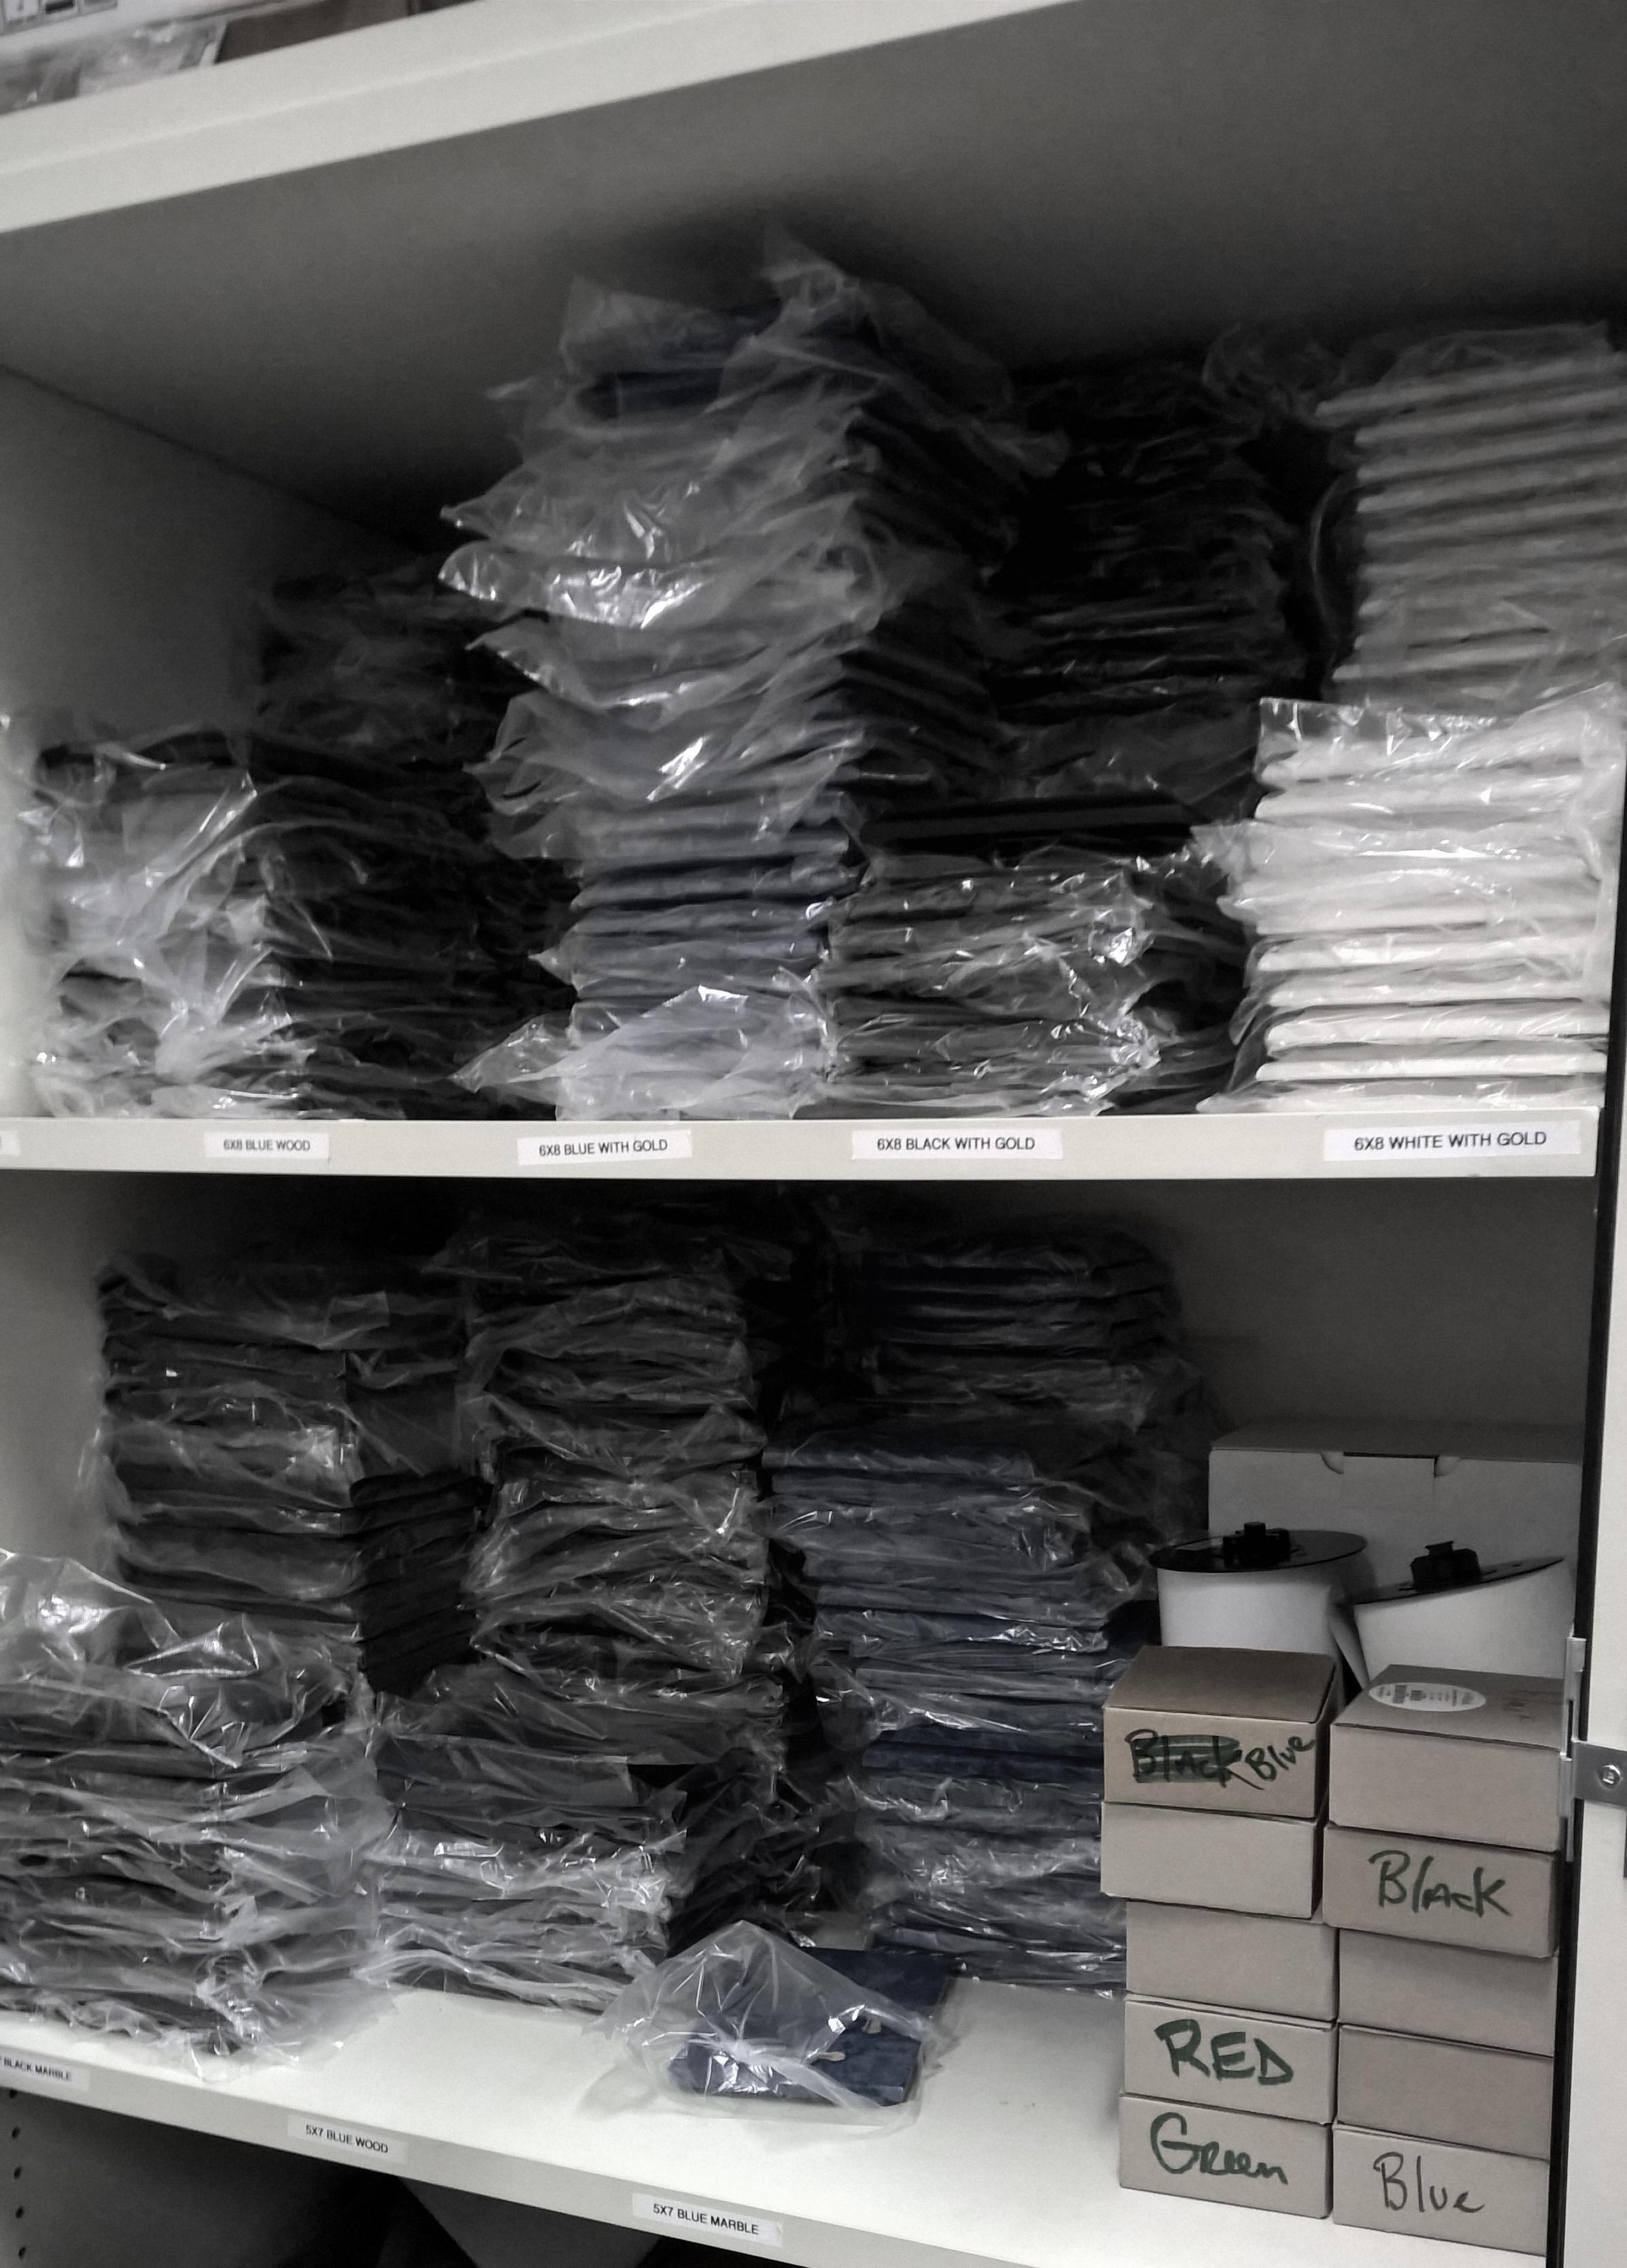 Supply_Cabinet2.jpg